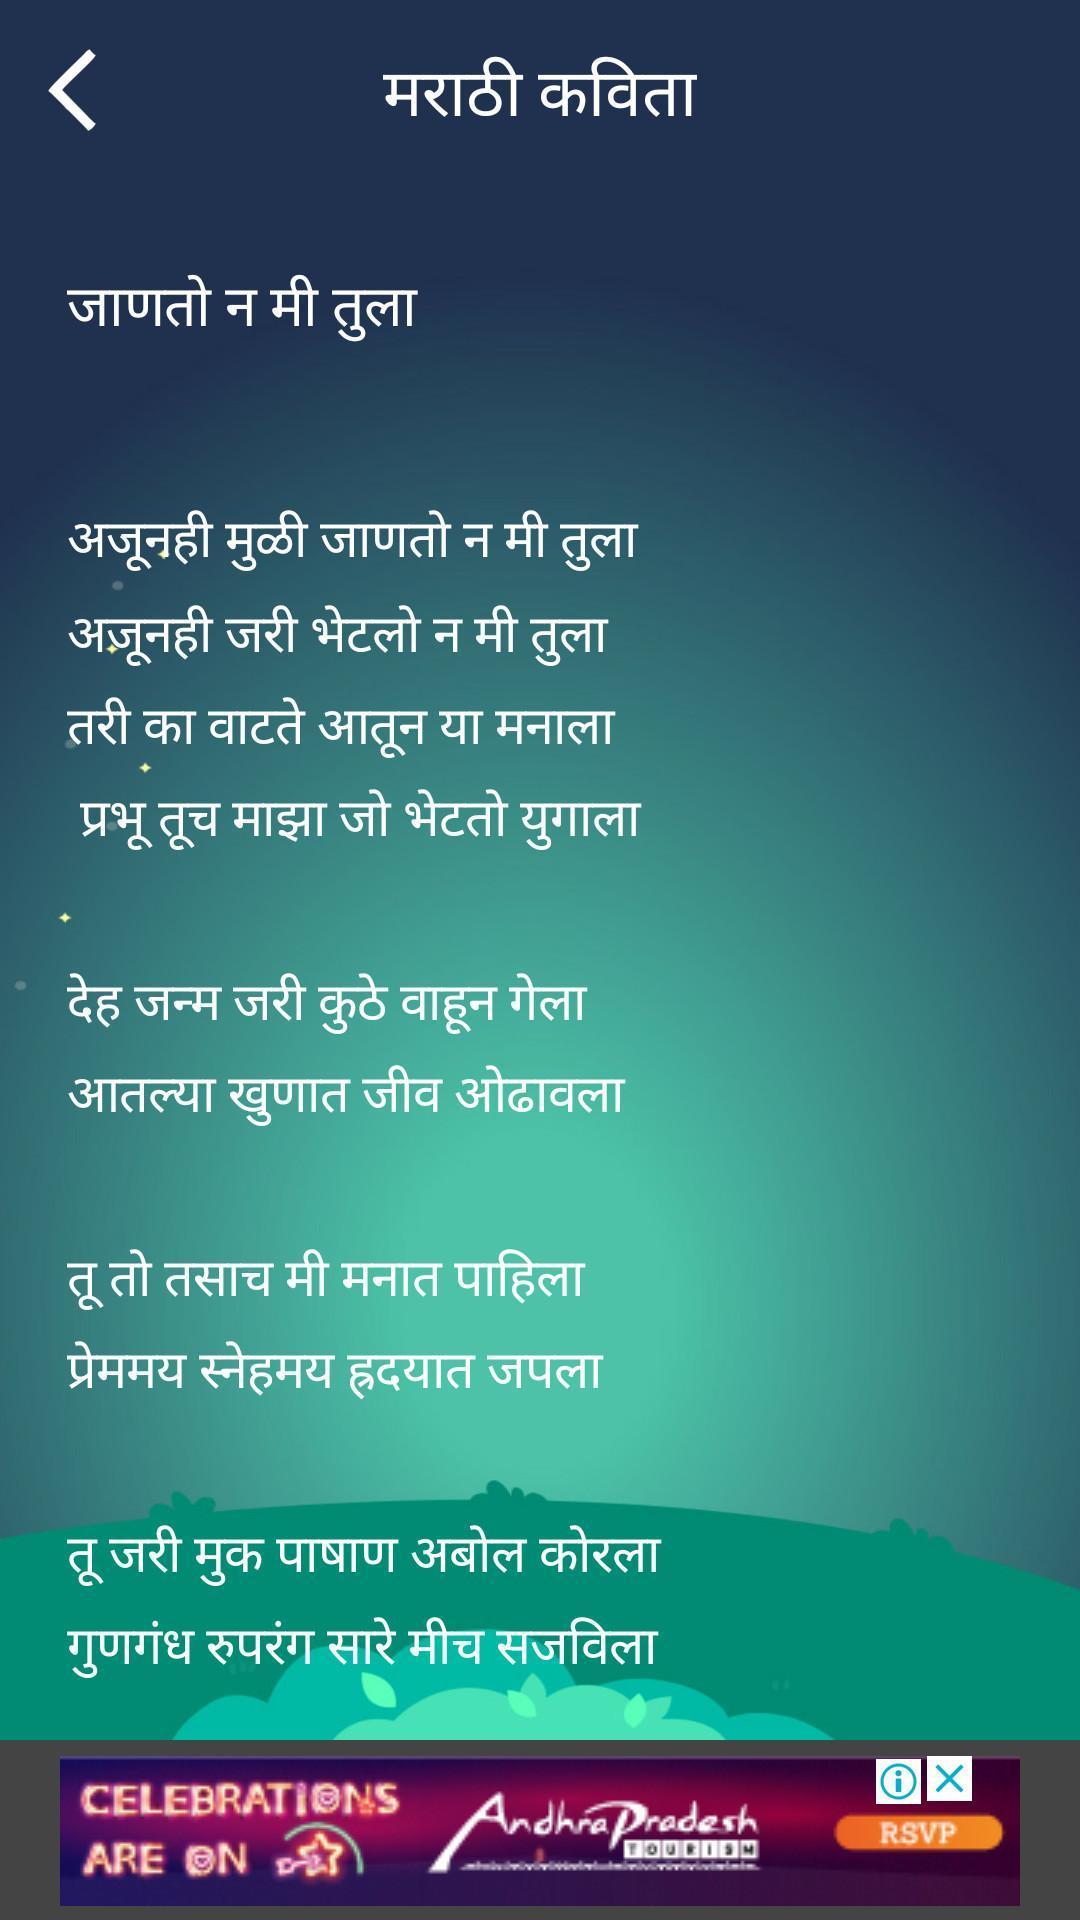 500+ Marathi Kavita Sangraha for Android - APK Download